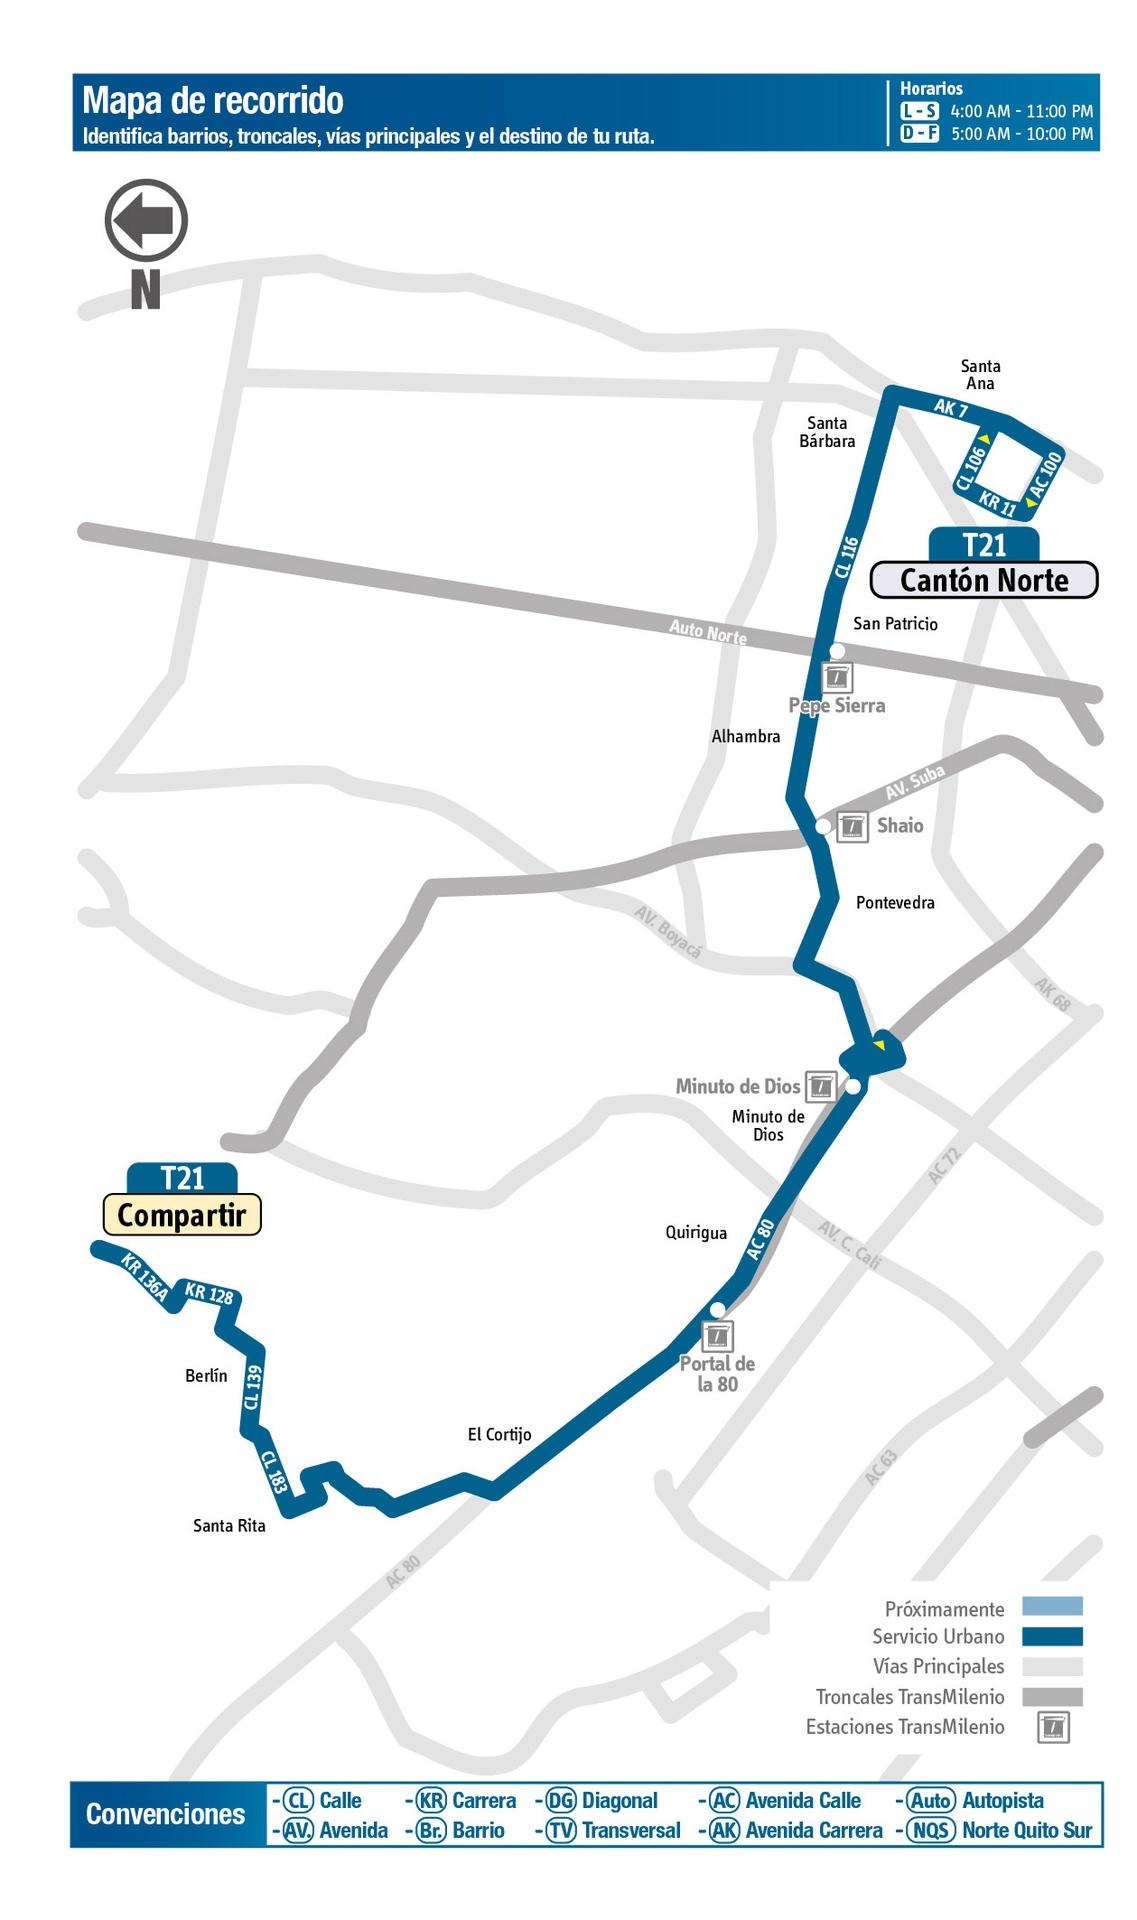 Ruta SITP: Ruta T21: Compartir ↔ Cantón Norte [Urbana] 2